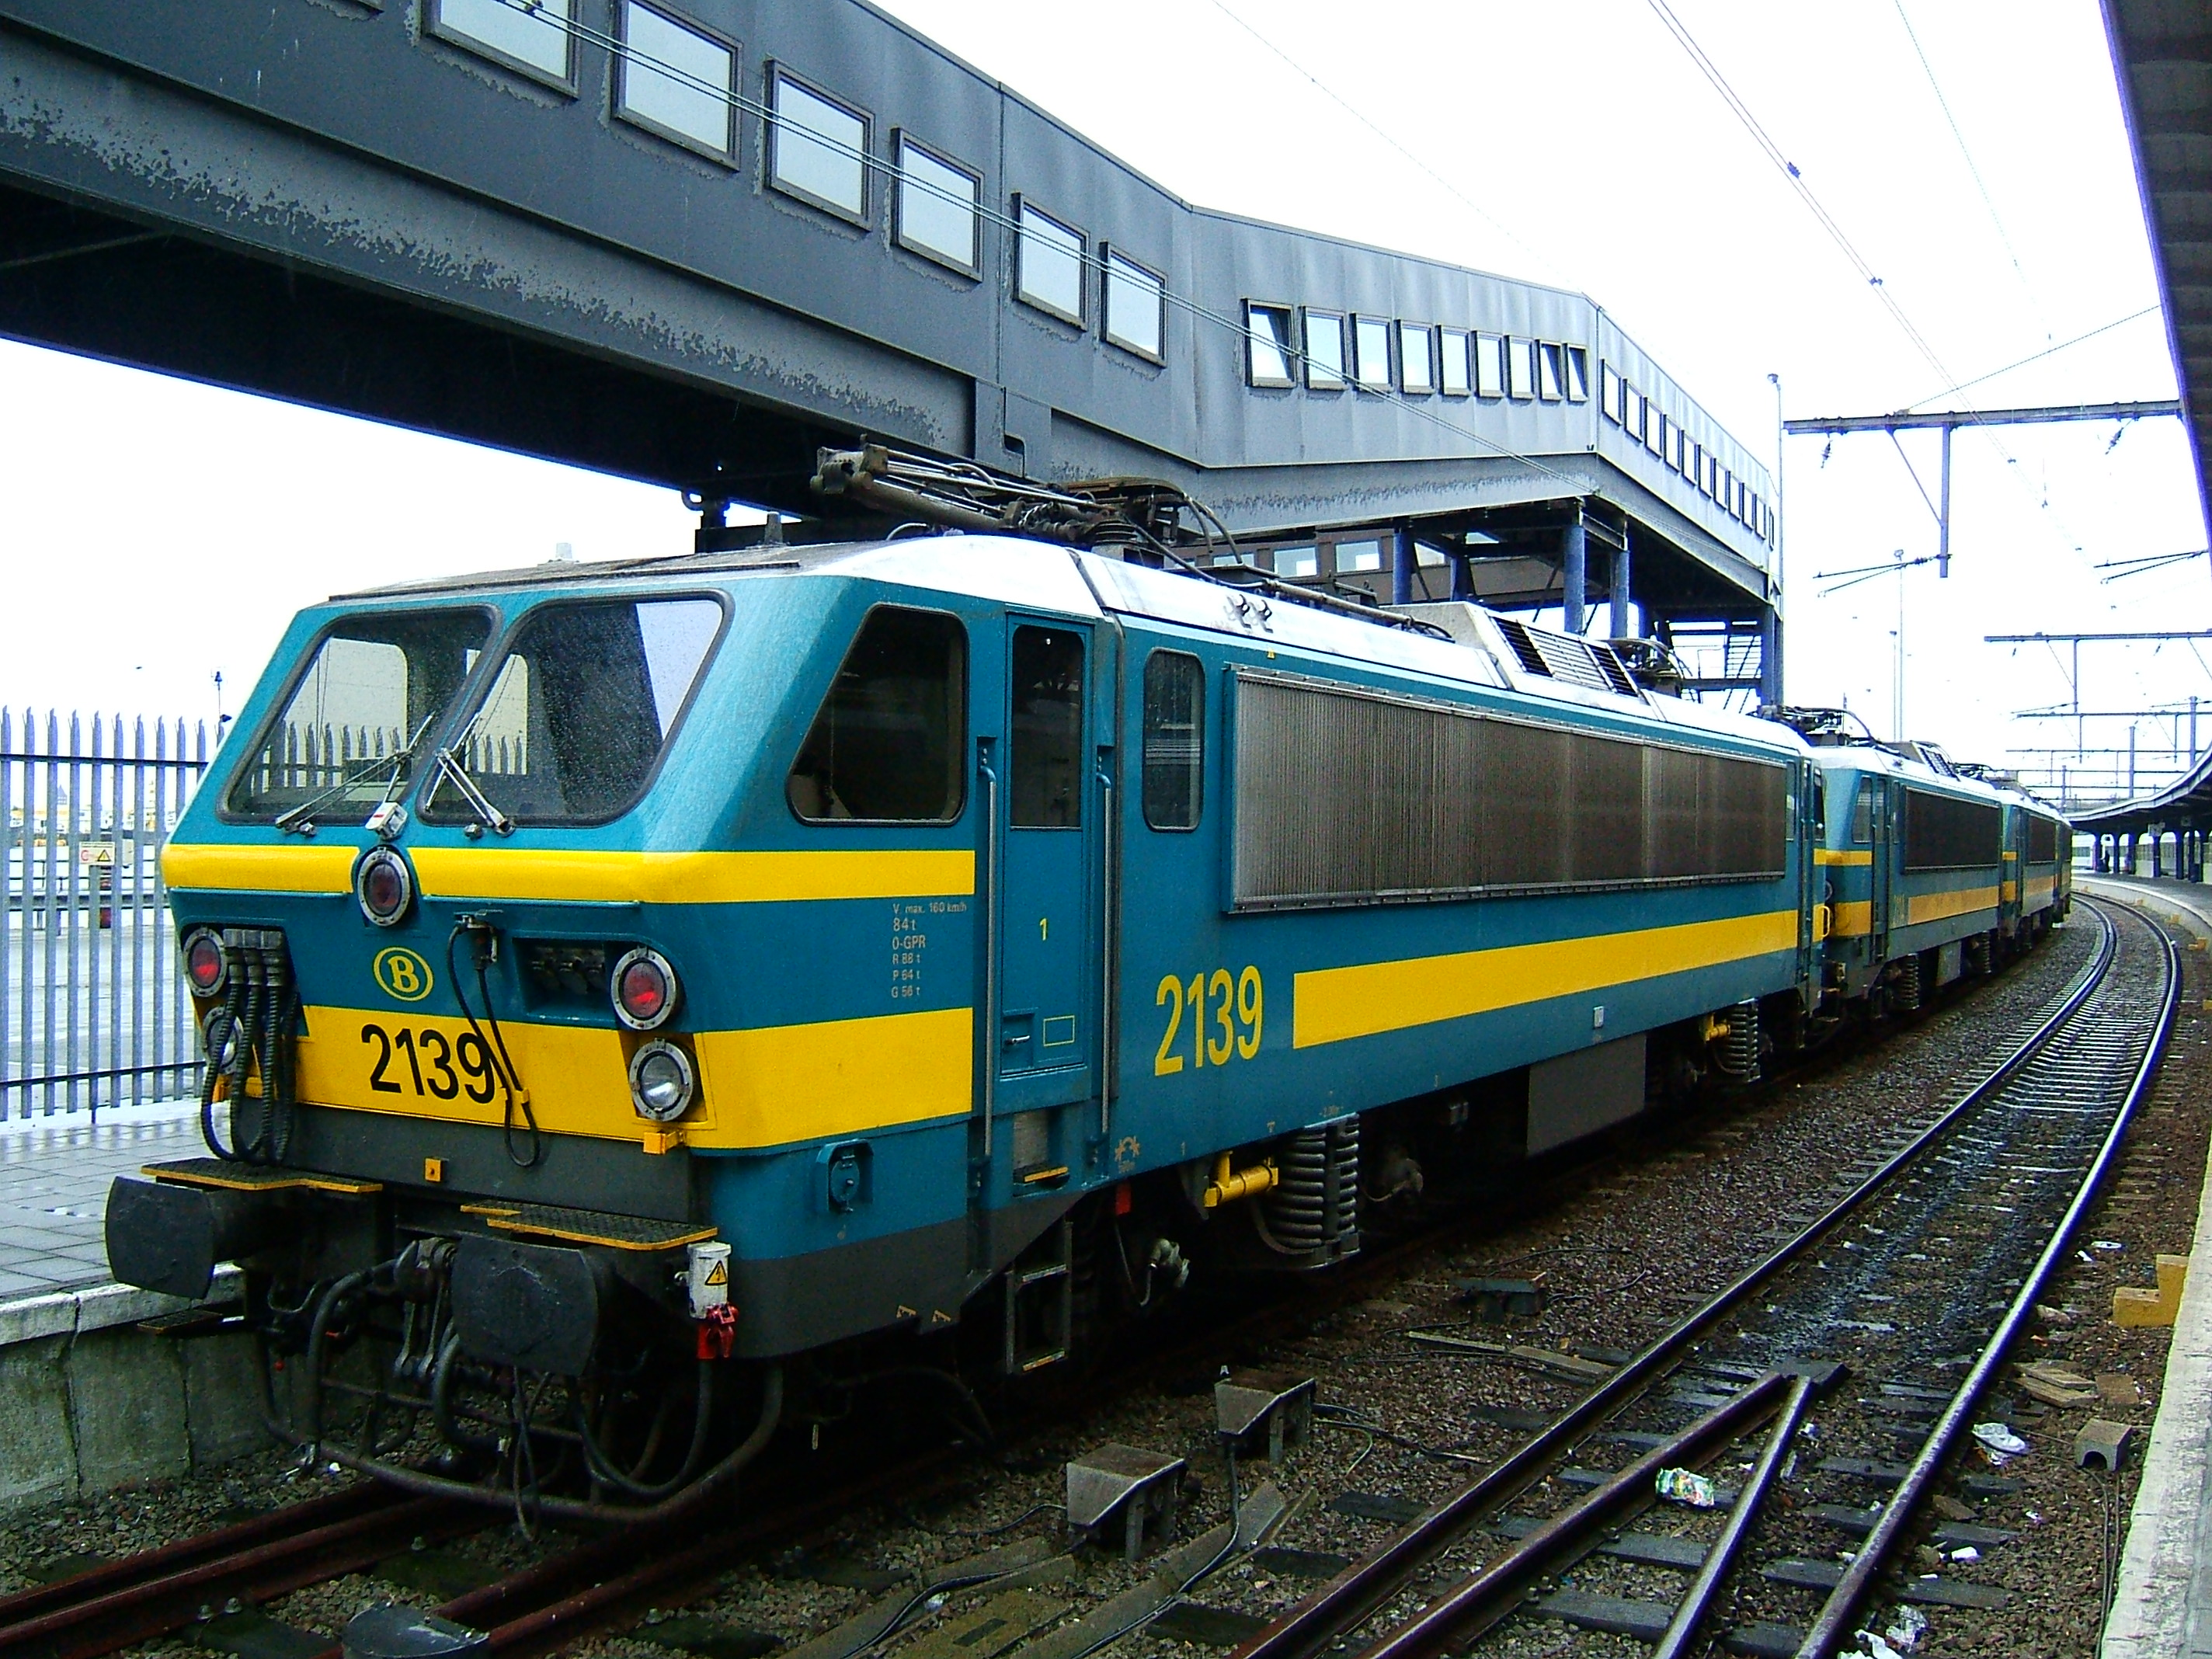 File:HLE 2139 Oostende.jpg